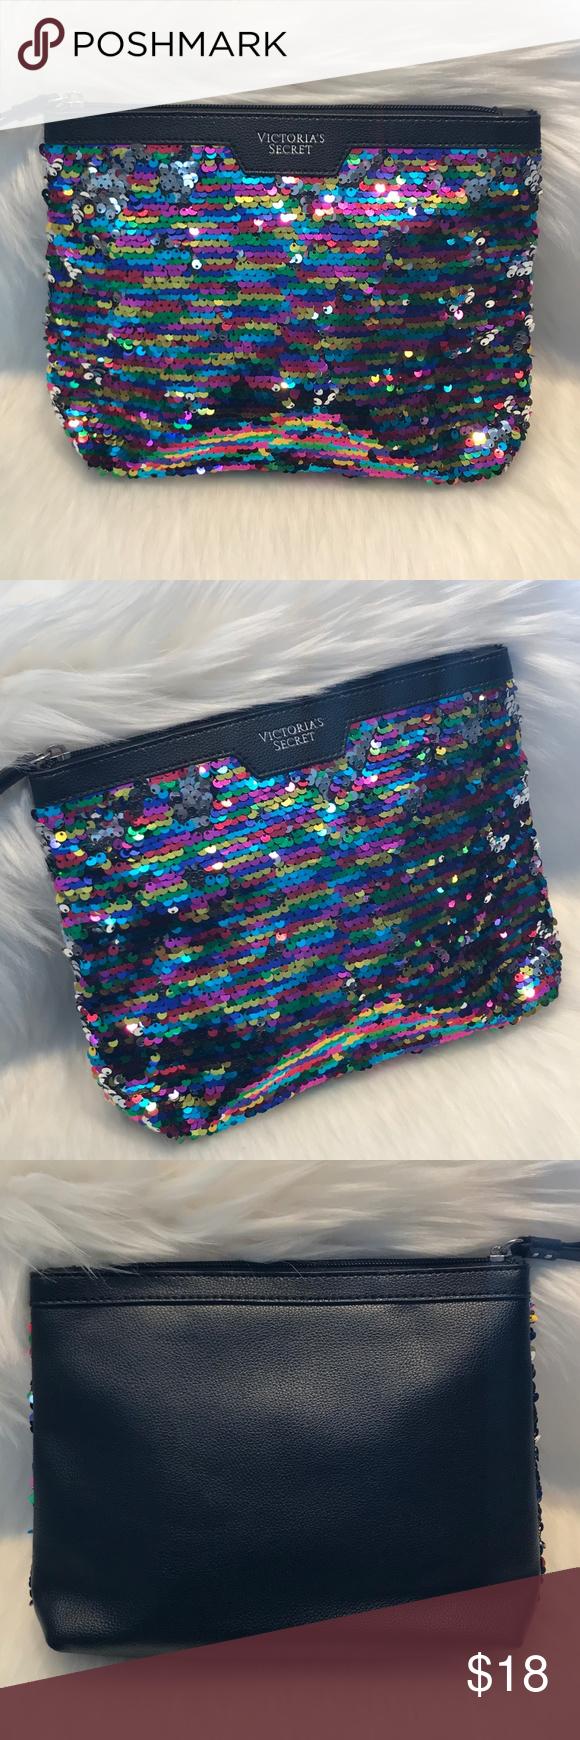 Victoria's Secret Multicolored Sequin Makeup Bag